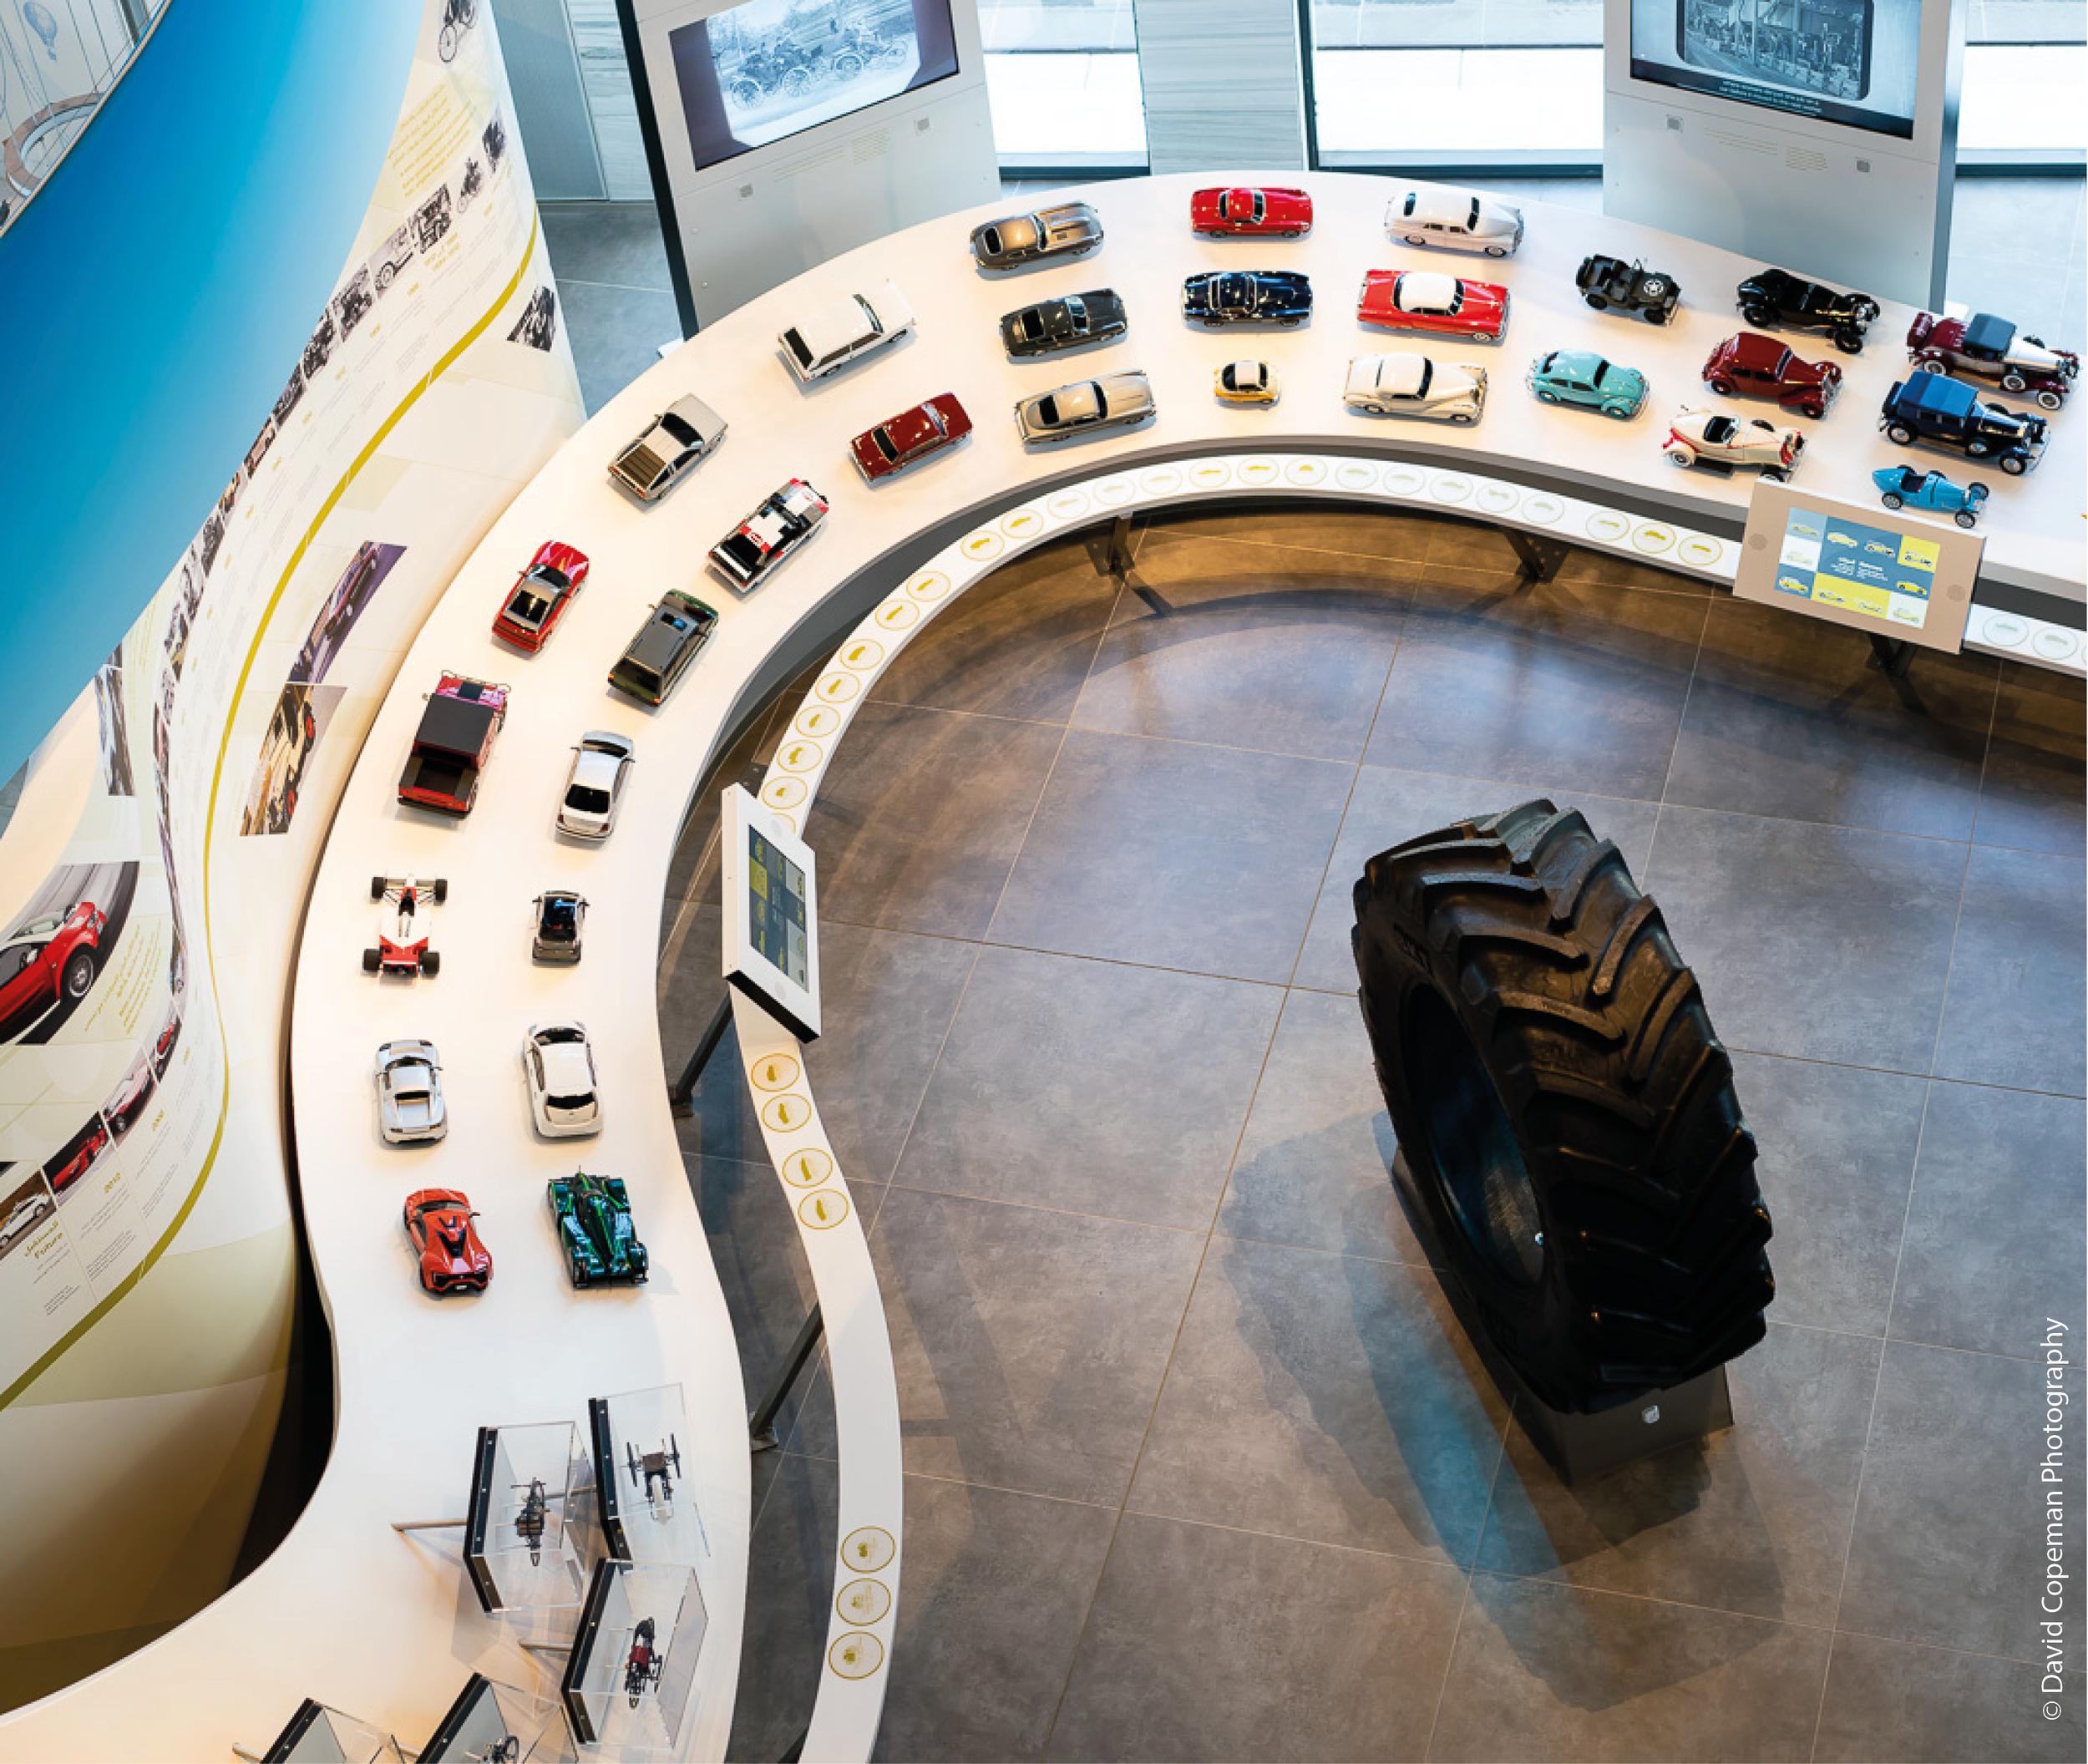 Sheikh Abdullah Al Salem Cultural Centre Transport gallery © David Copeman Photography